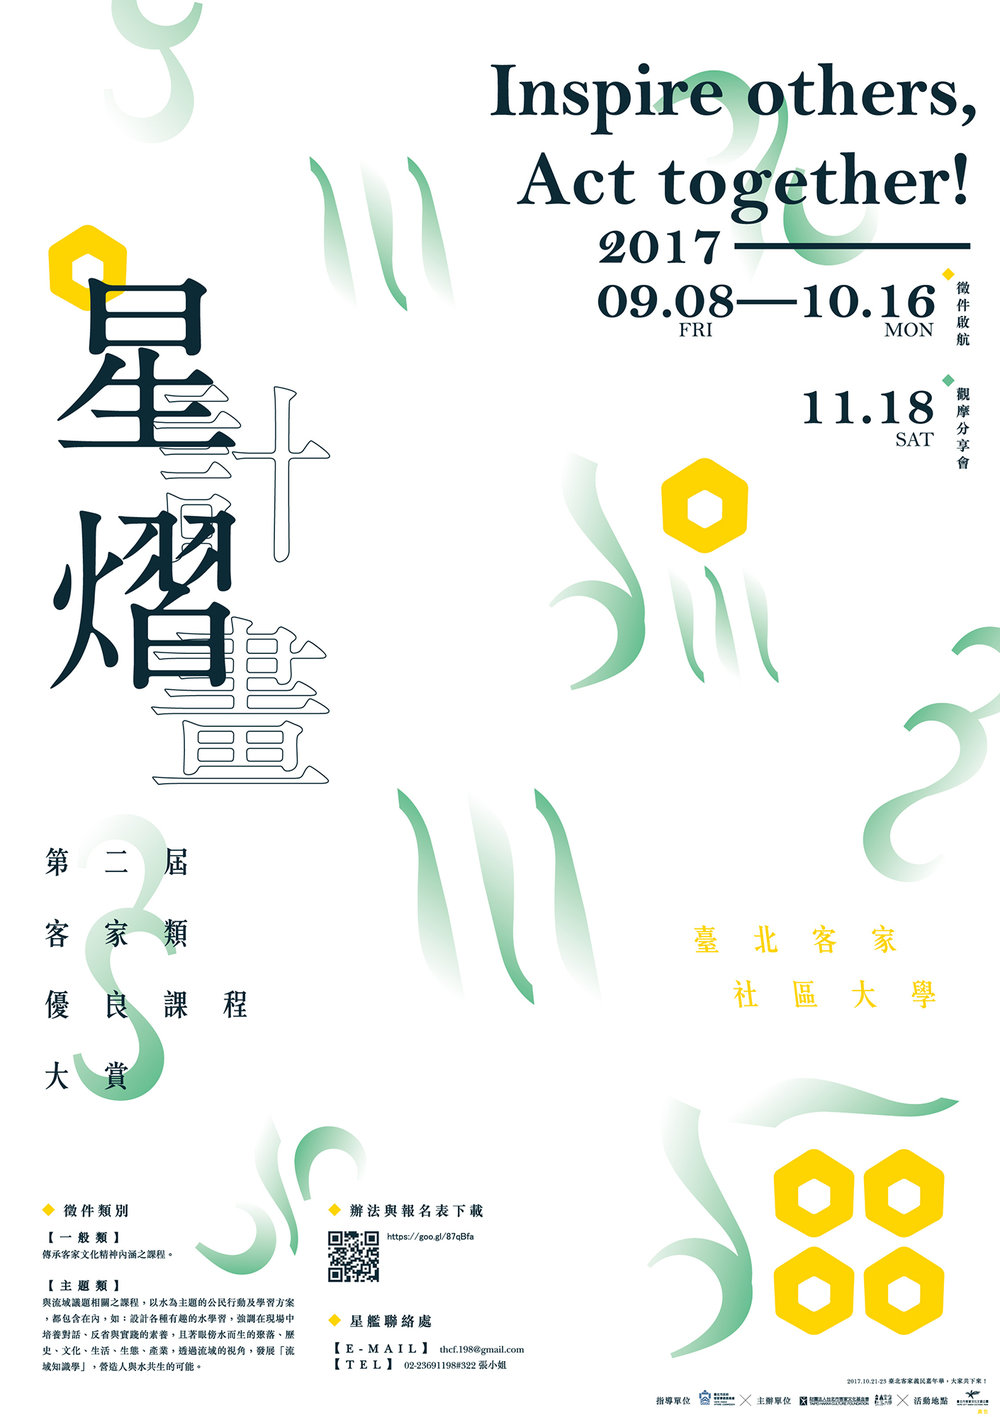 event-106-第二屆客家類優良課程大賞-徵件海報.jpg